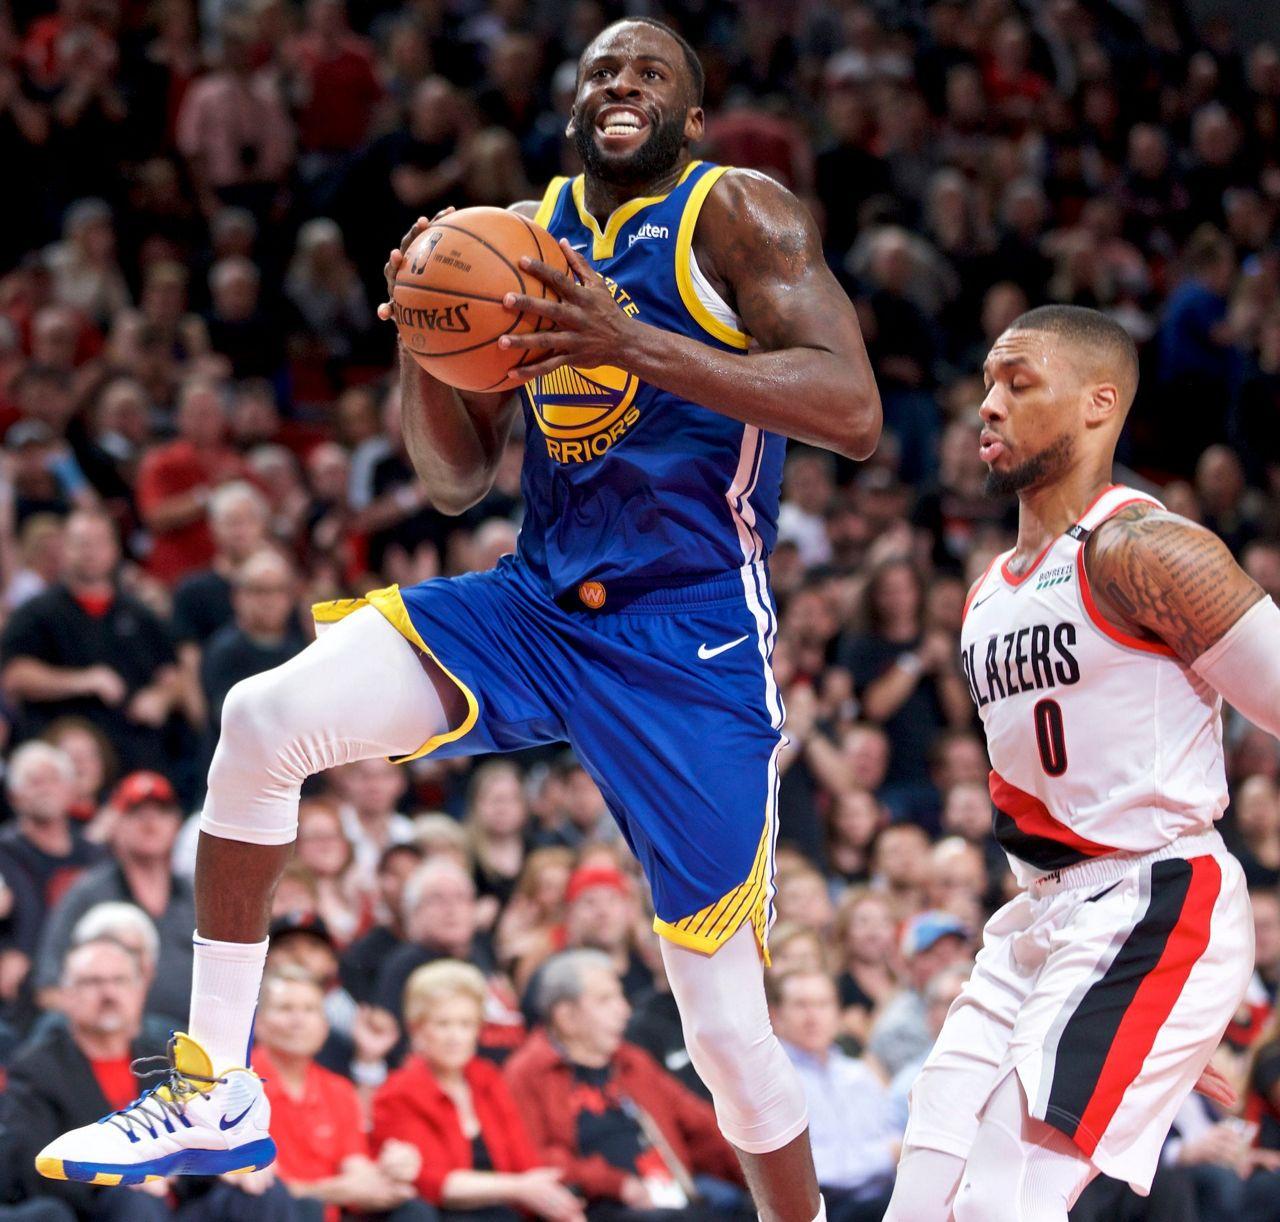 Portland Blazers 2019: Green, Warriors Beat Blazers For 3-0 Lead In West Finals